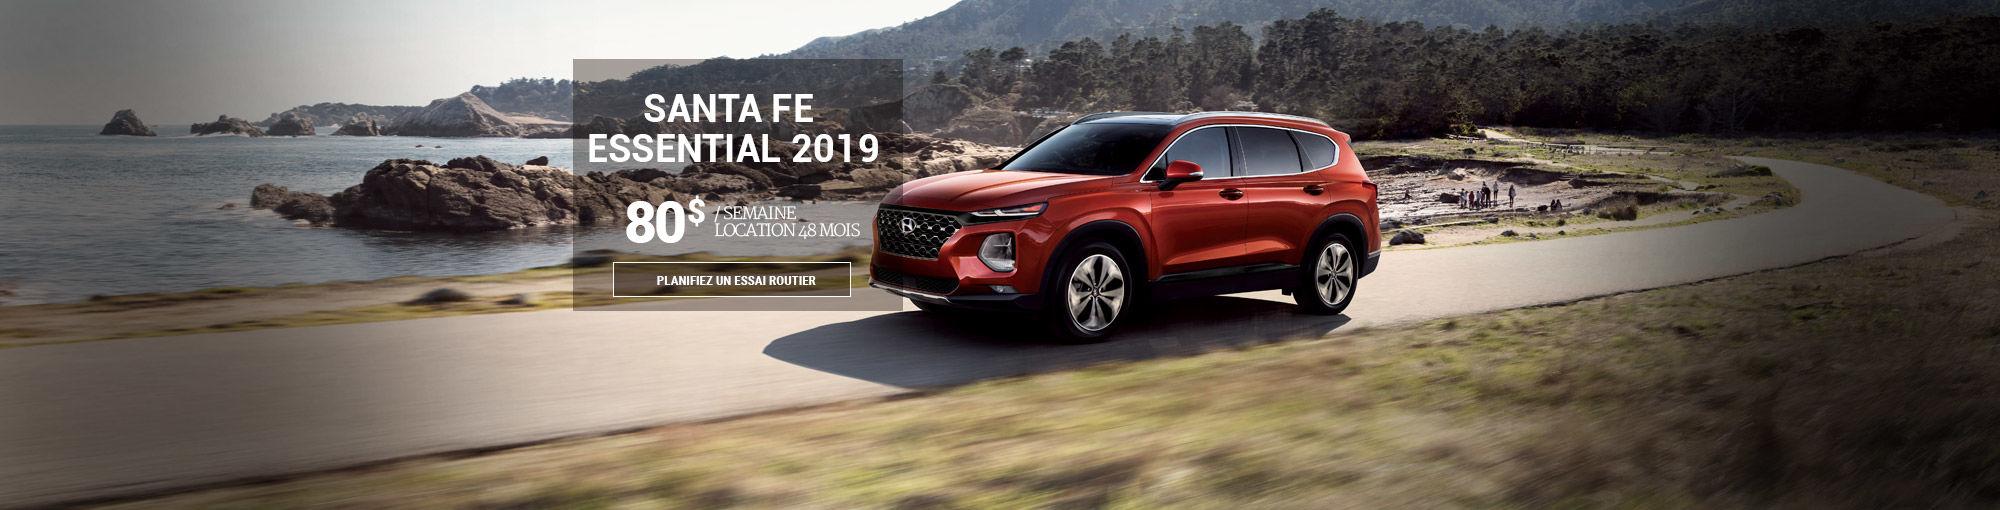 Hyundai Santa Fe 2019 header février